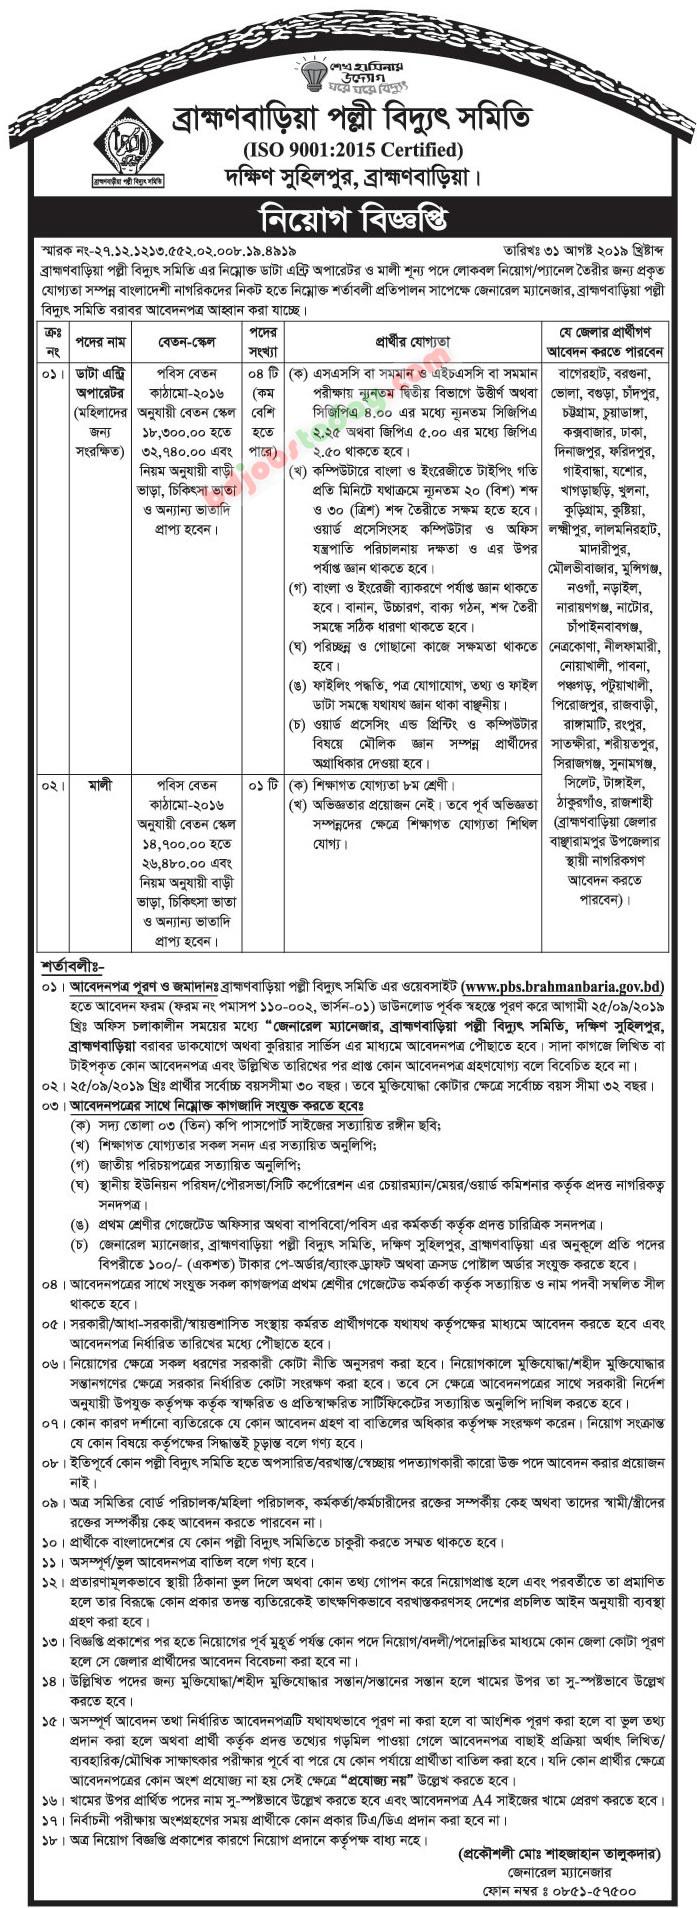 Bangladesh Palli Bidyut Samity Job